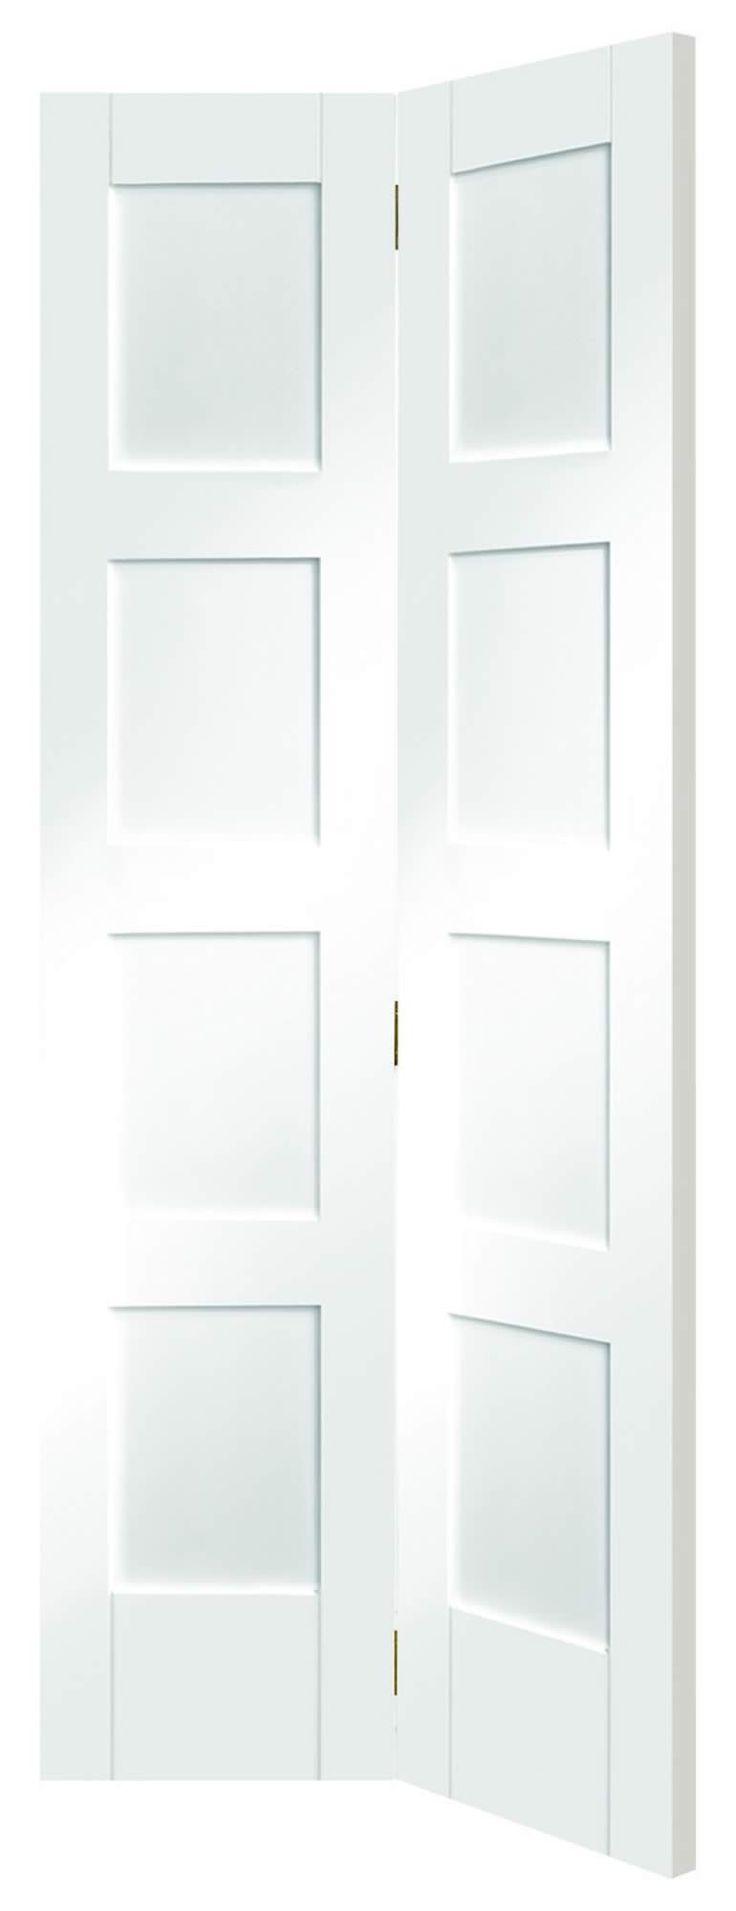 best 25+ 4 panel shaker doors ideas on pinterest | shaker doors, 1